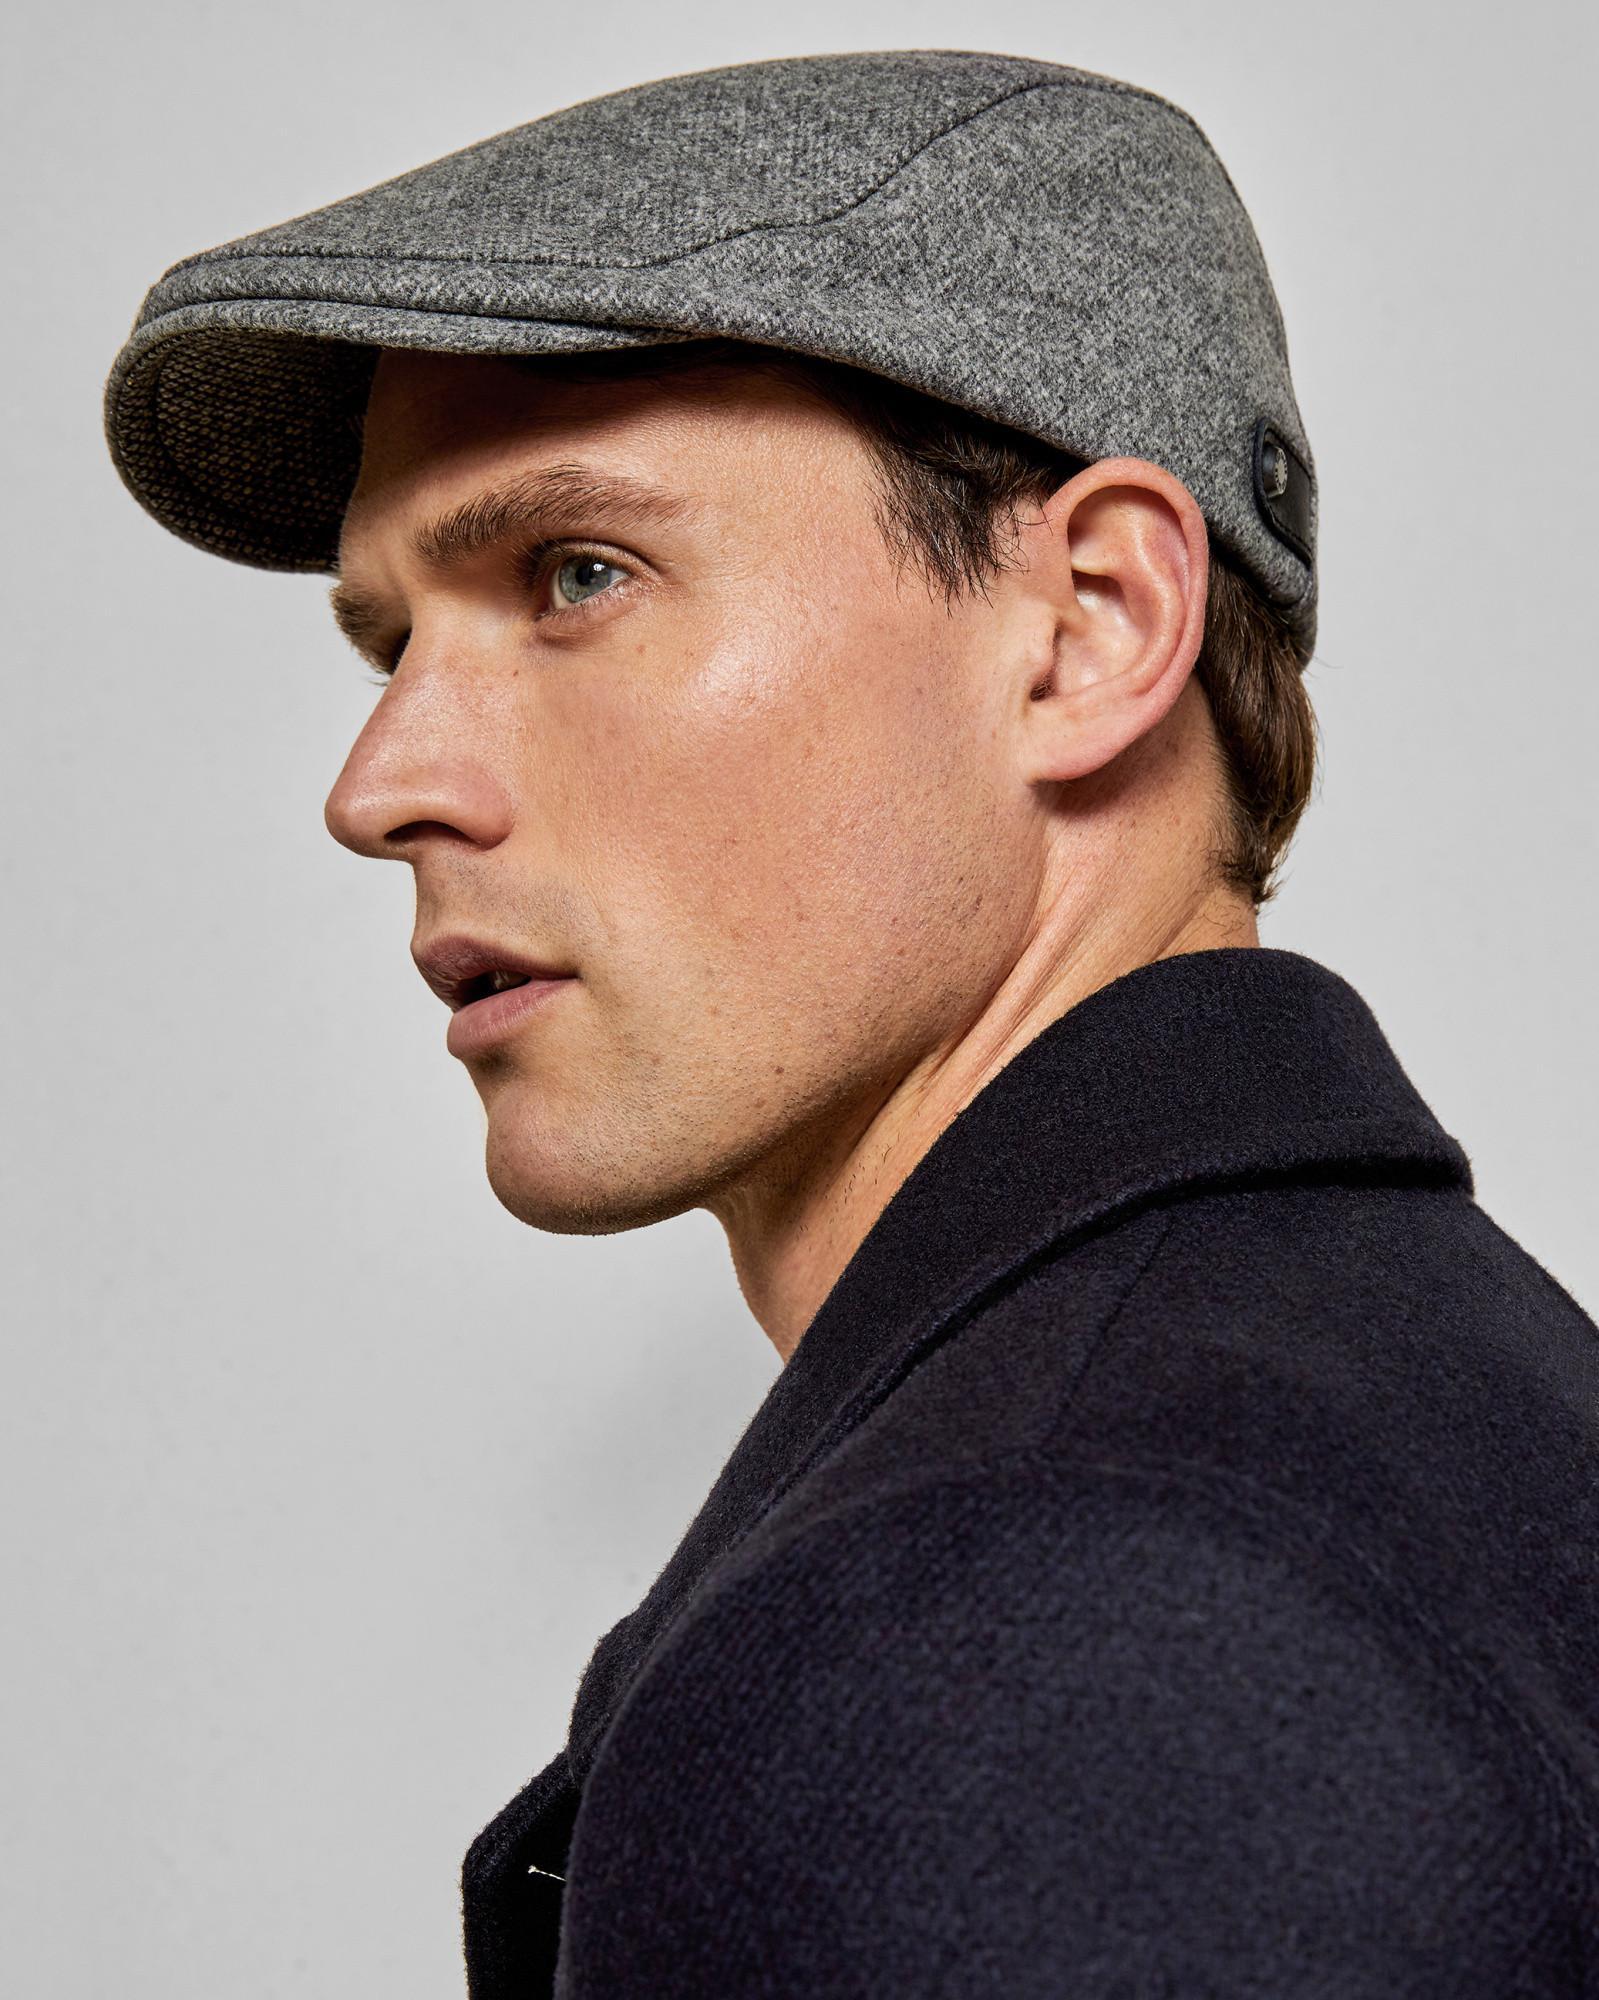 Ted Baker Textured Flat Cap in Gray for Men - Lyst b7f07c5190da